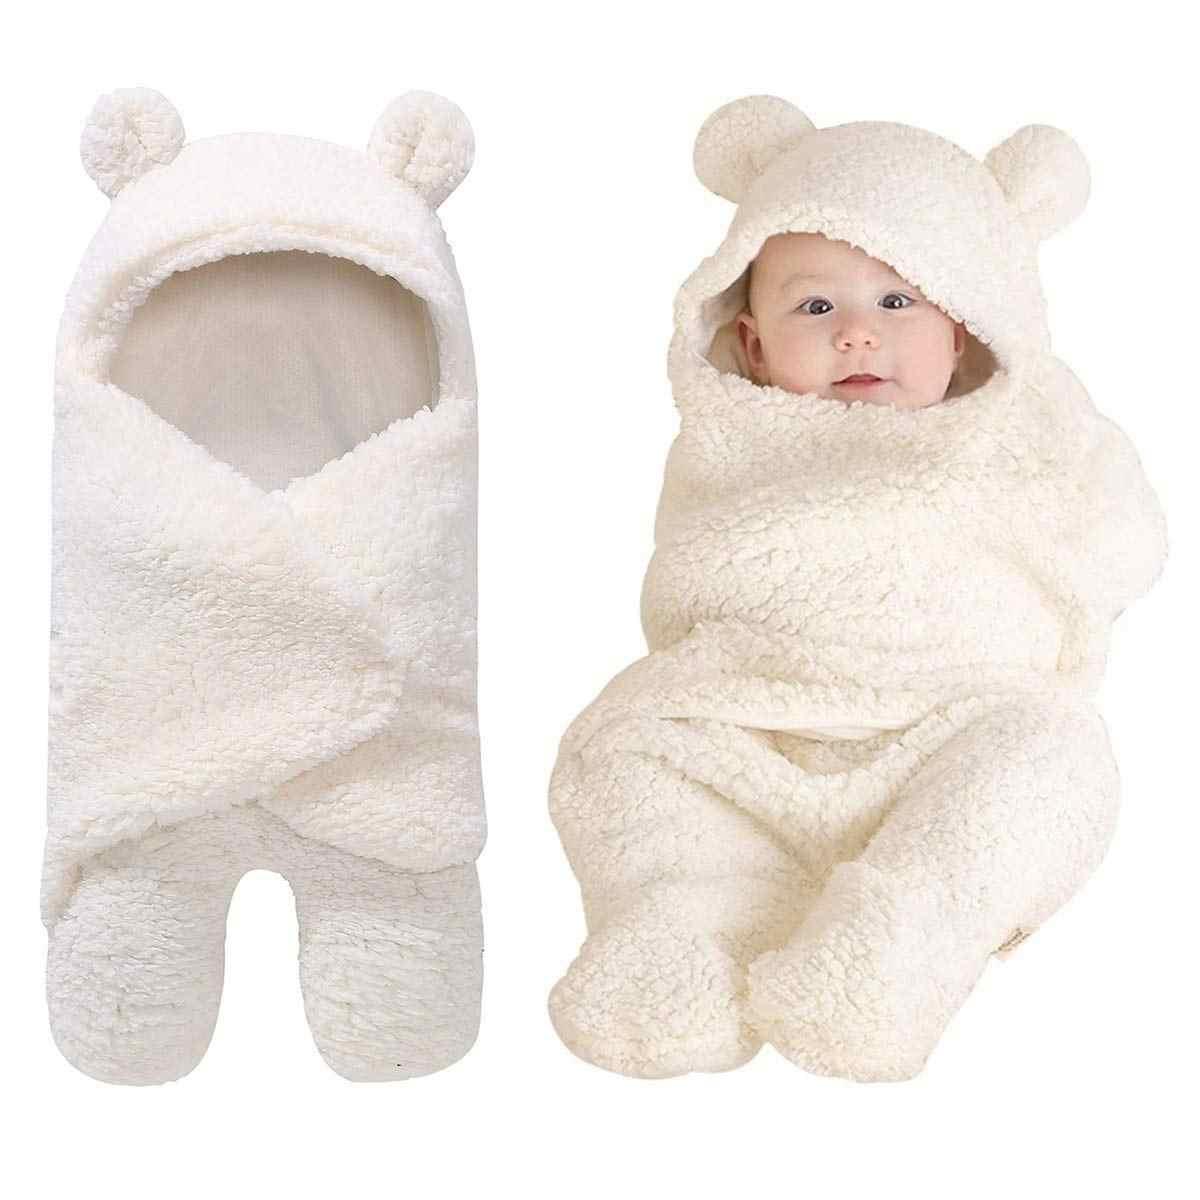 Newborn Baby Cotton Plush Hooded Wrap Blanket Fleece Swaddle Lovely Teddy Bear Sleeping Bag Wrap Clothes Swaddle Sleeping Bag